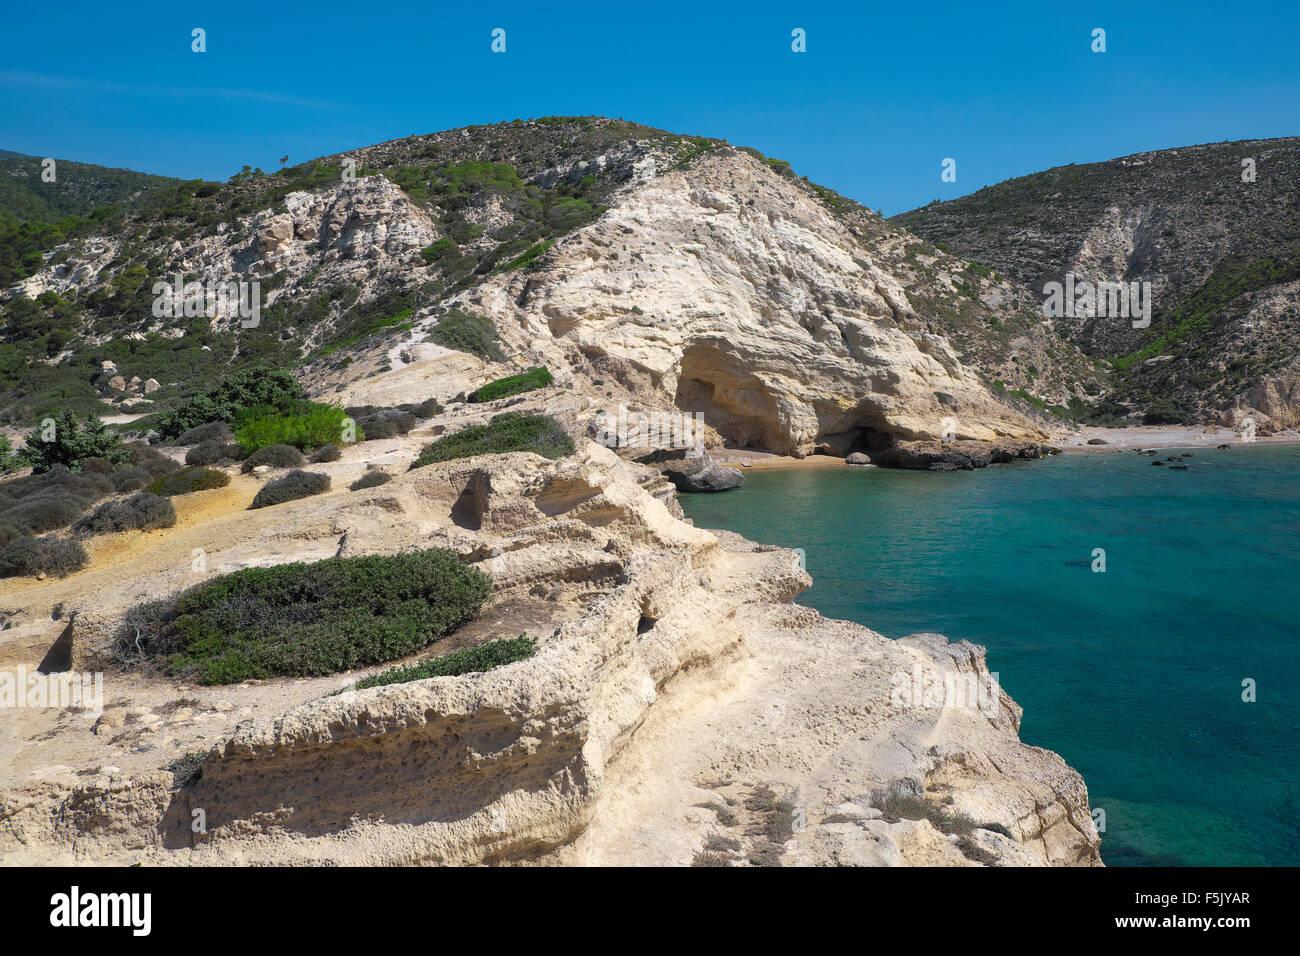 Fourni beach, Rhodes, Dodecanese, Greece - Stock Image